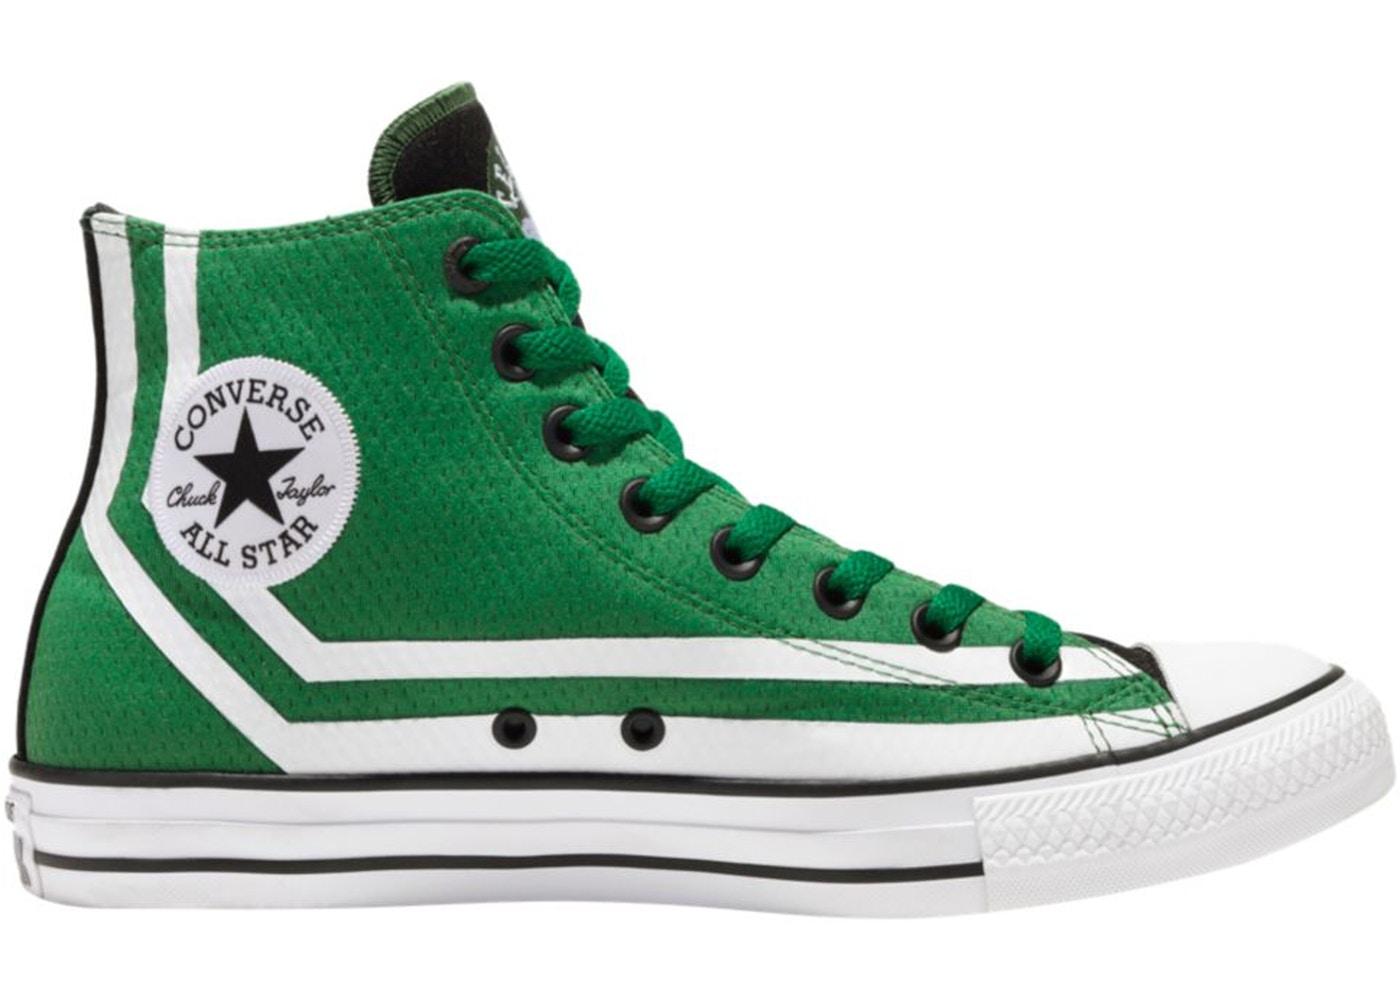 Alboroto Descompostura Generalizar  Converse Chuck Taylor All-Star 70s Hi Franchise Boston Celtics - 159421C